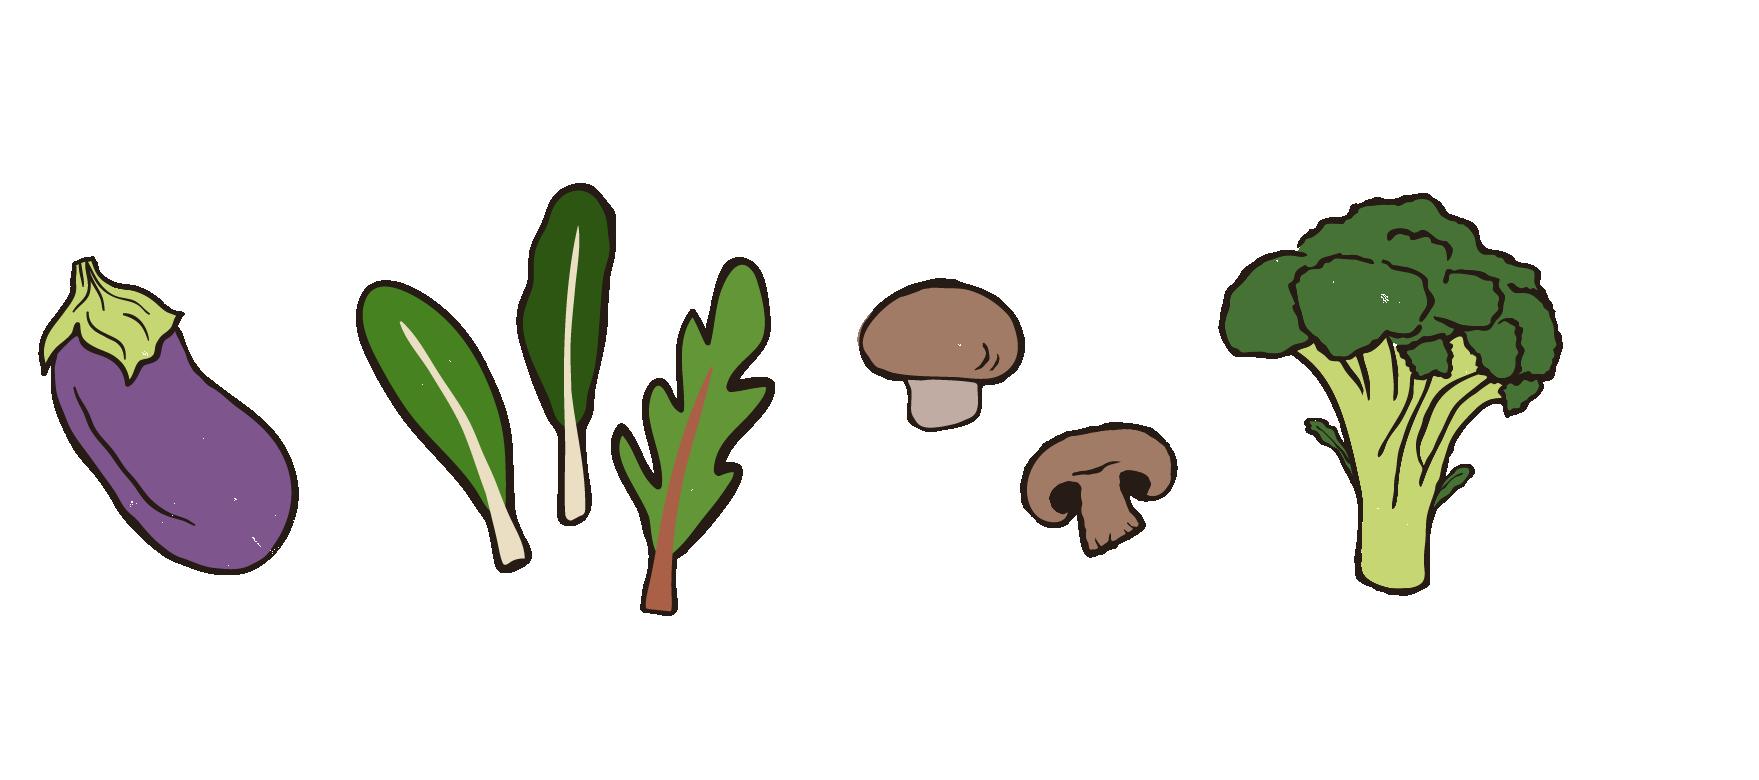 web-assets-veggies-12.png